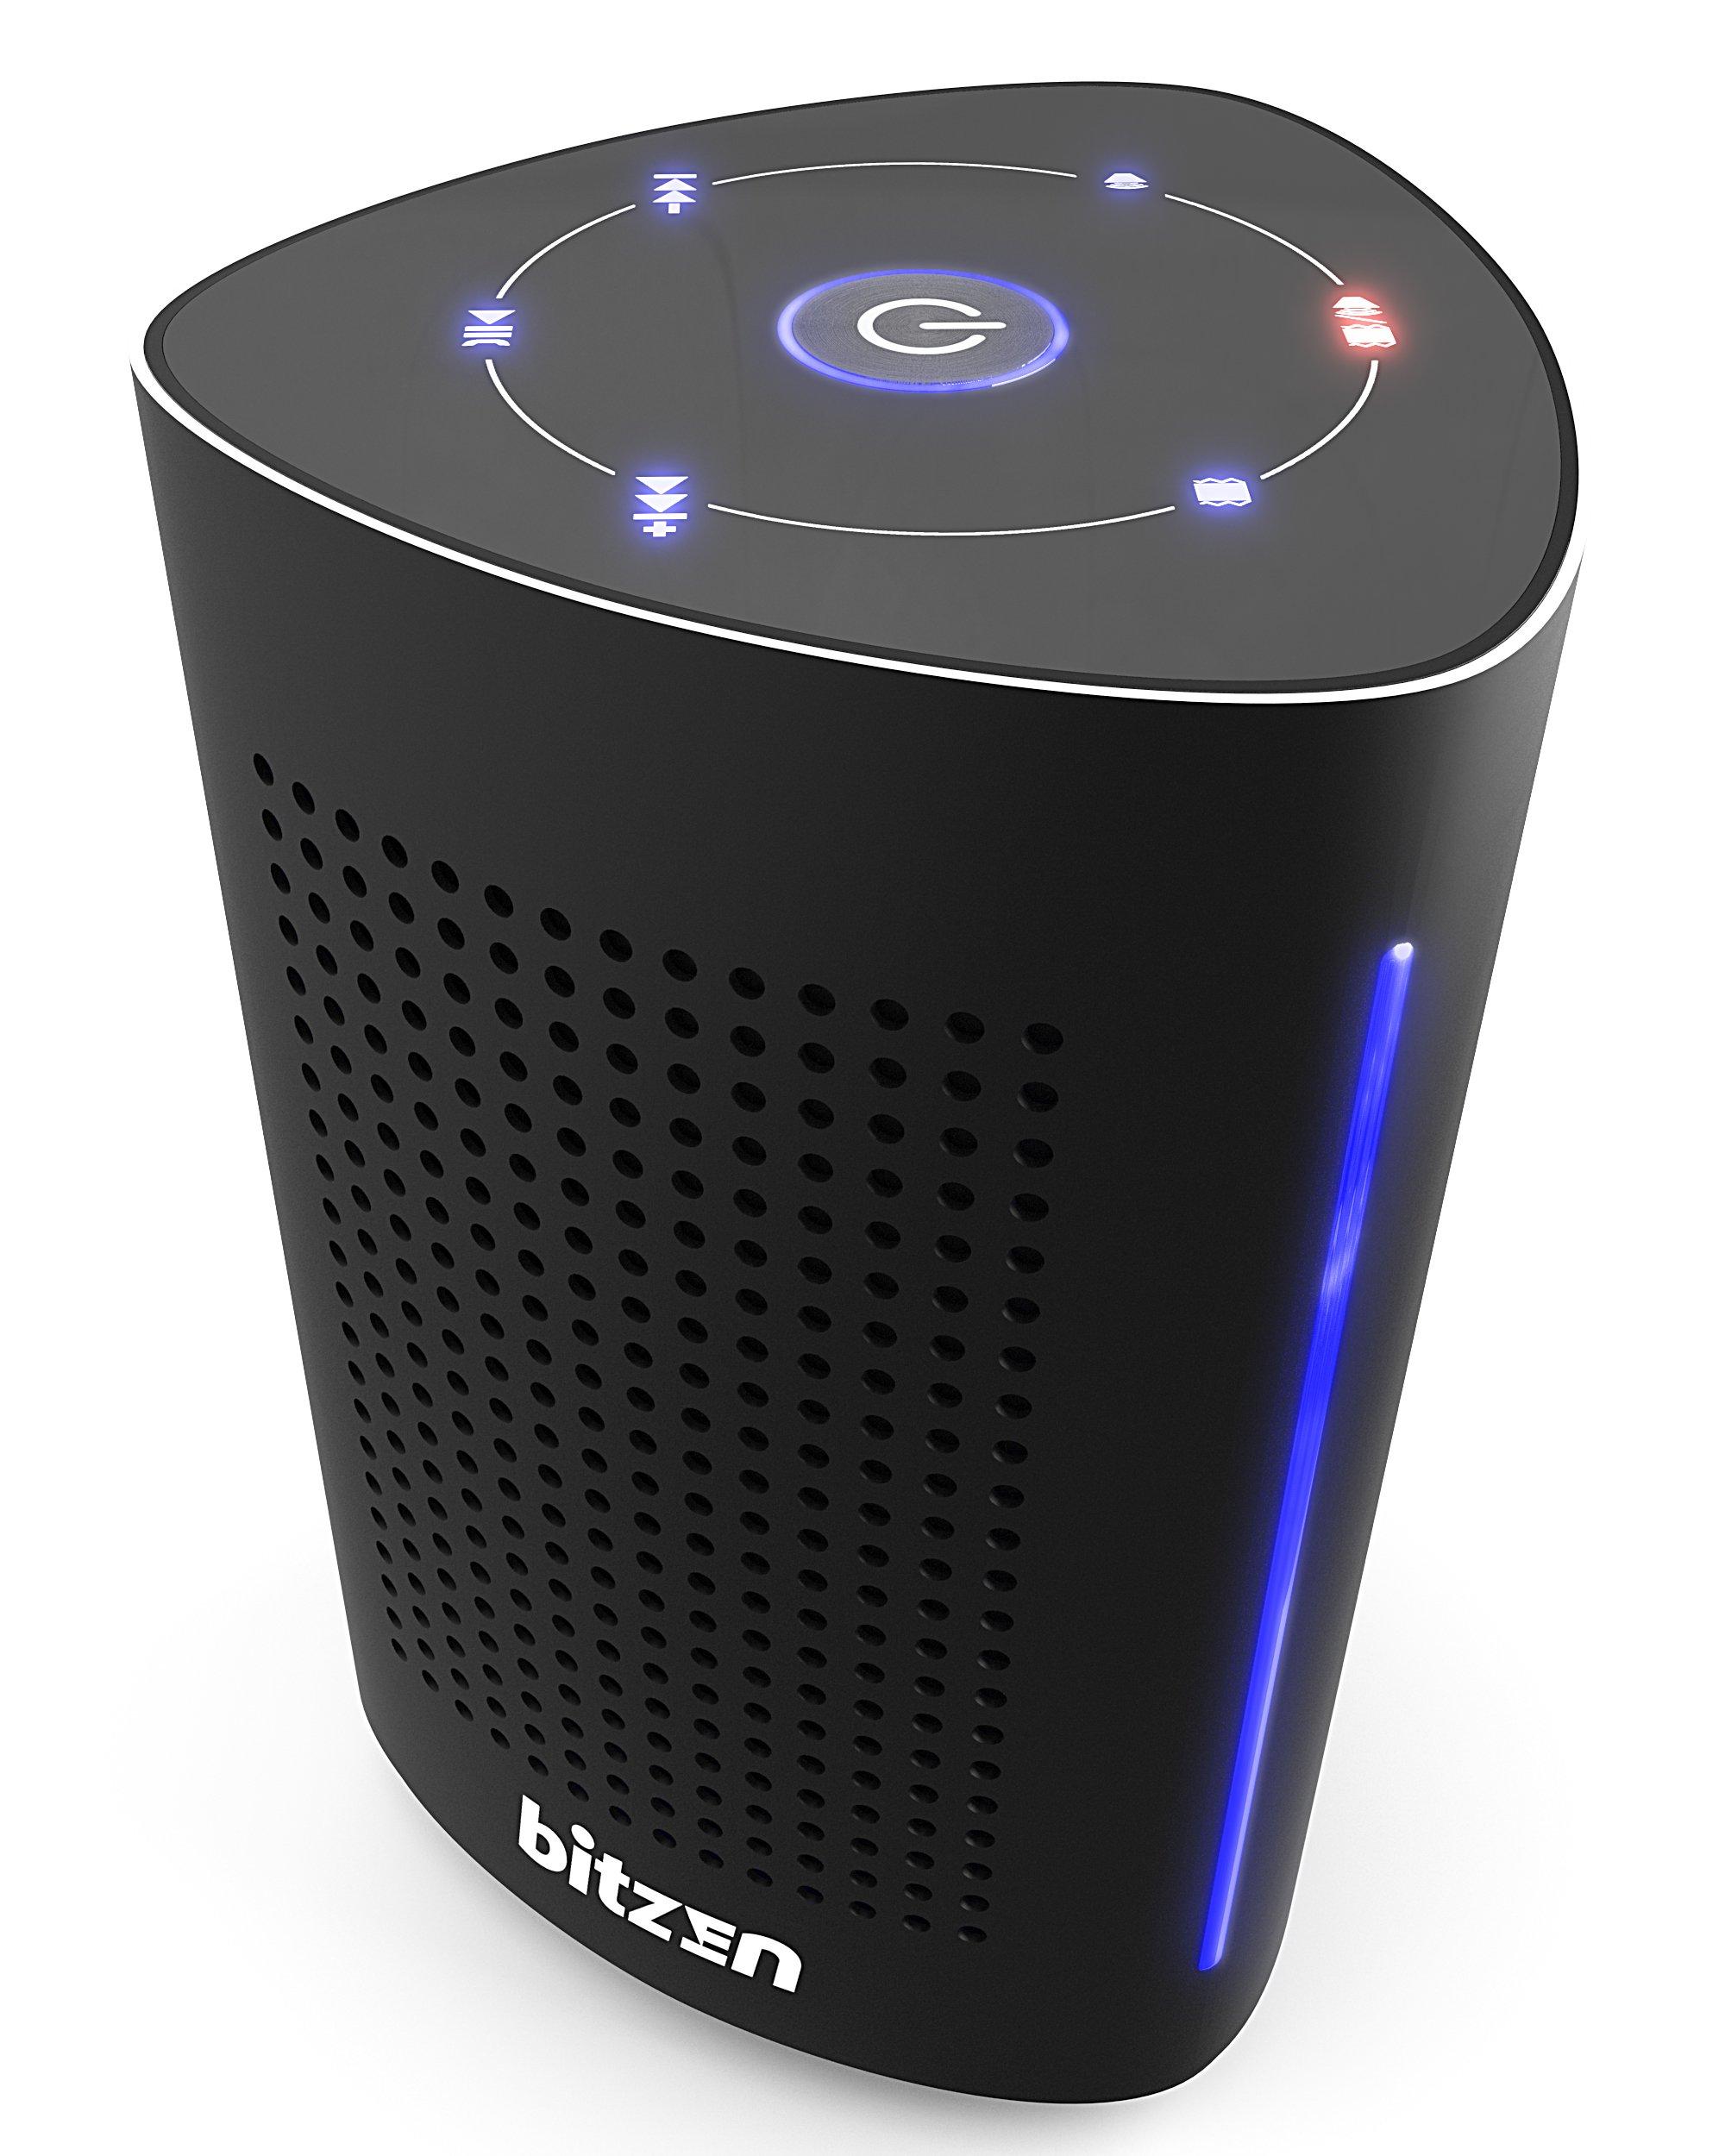 Bluetooth Computer Speaker – Wireless Bluetooth Speaker – Bluetooth Speaker for Women Men – Audio Bluetooth Speaker for iPhone Android Laptop – True Wireless Speakers – Portable Bluetooth Speakers by Bitzen (Image #1)